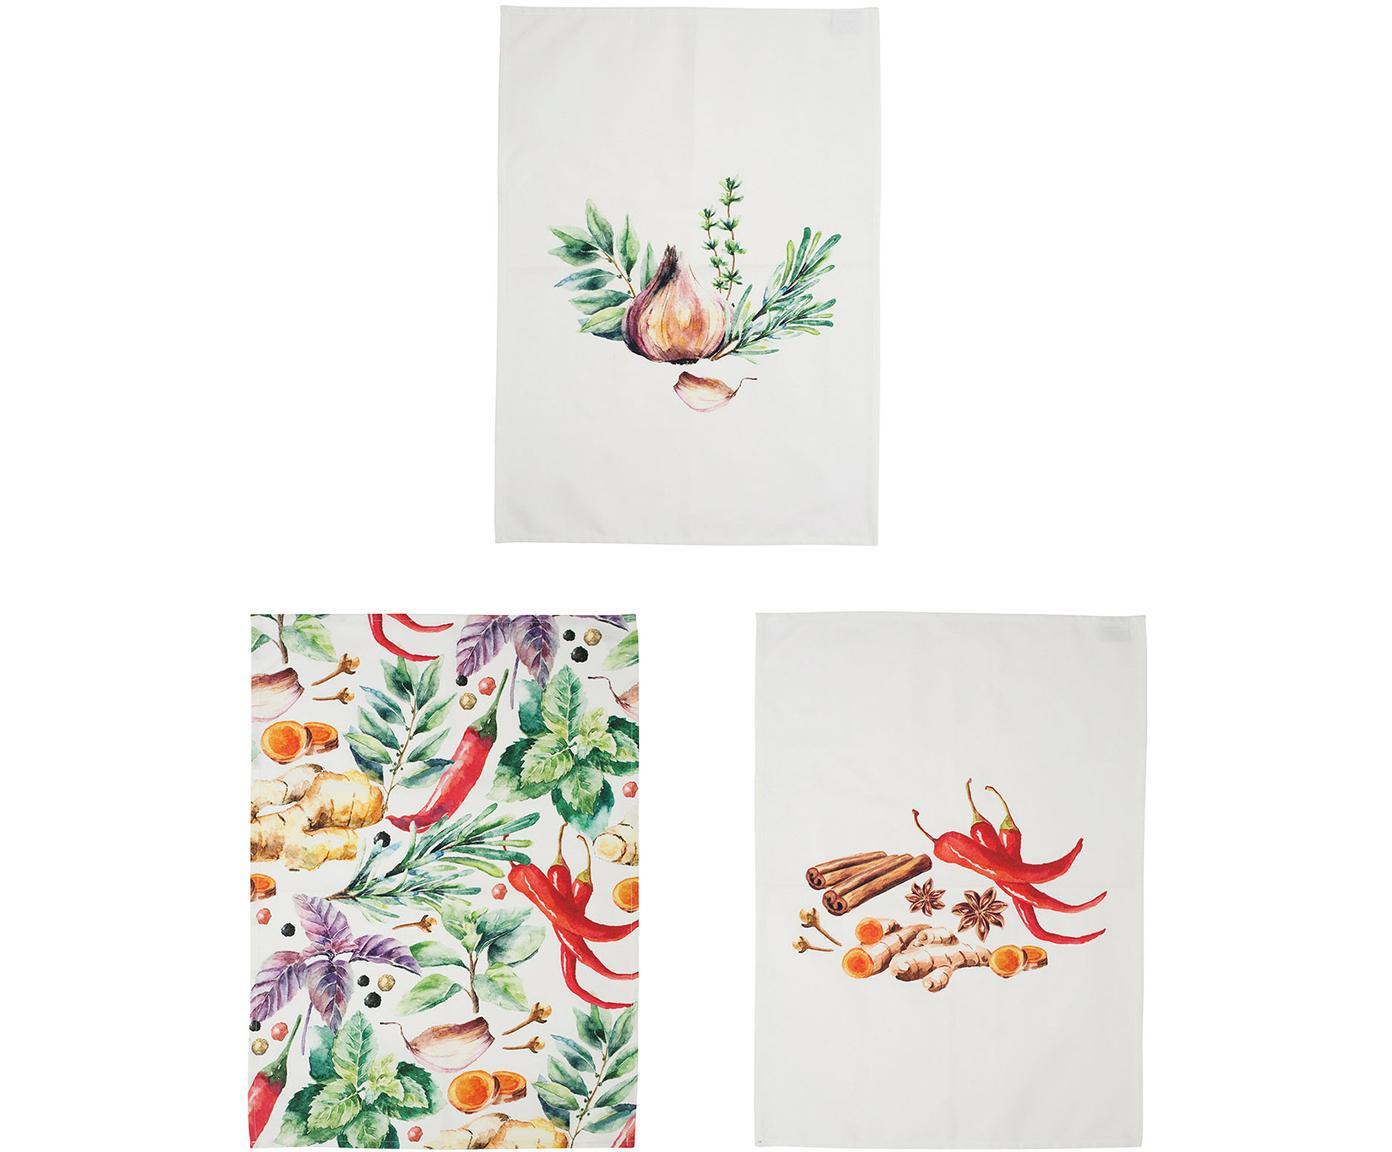 Set de paños de cocina Epices, 3pzas., Algodón, Blanco, verde, rojo, An 50 x L 70 cm